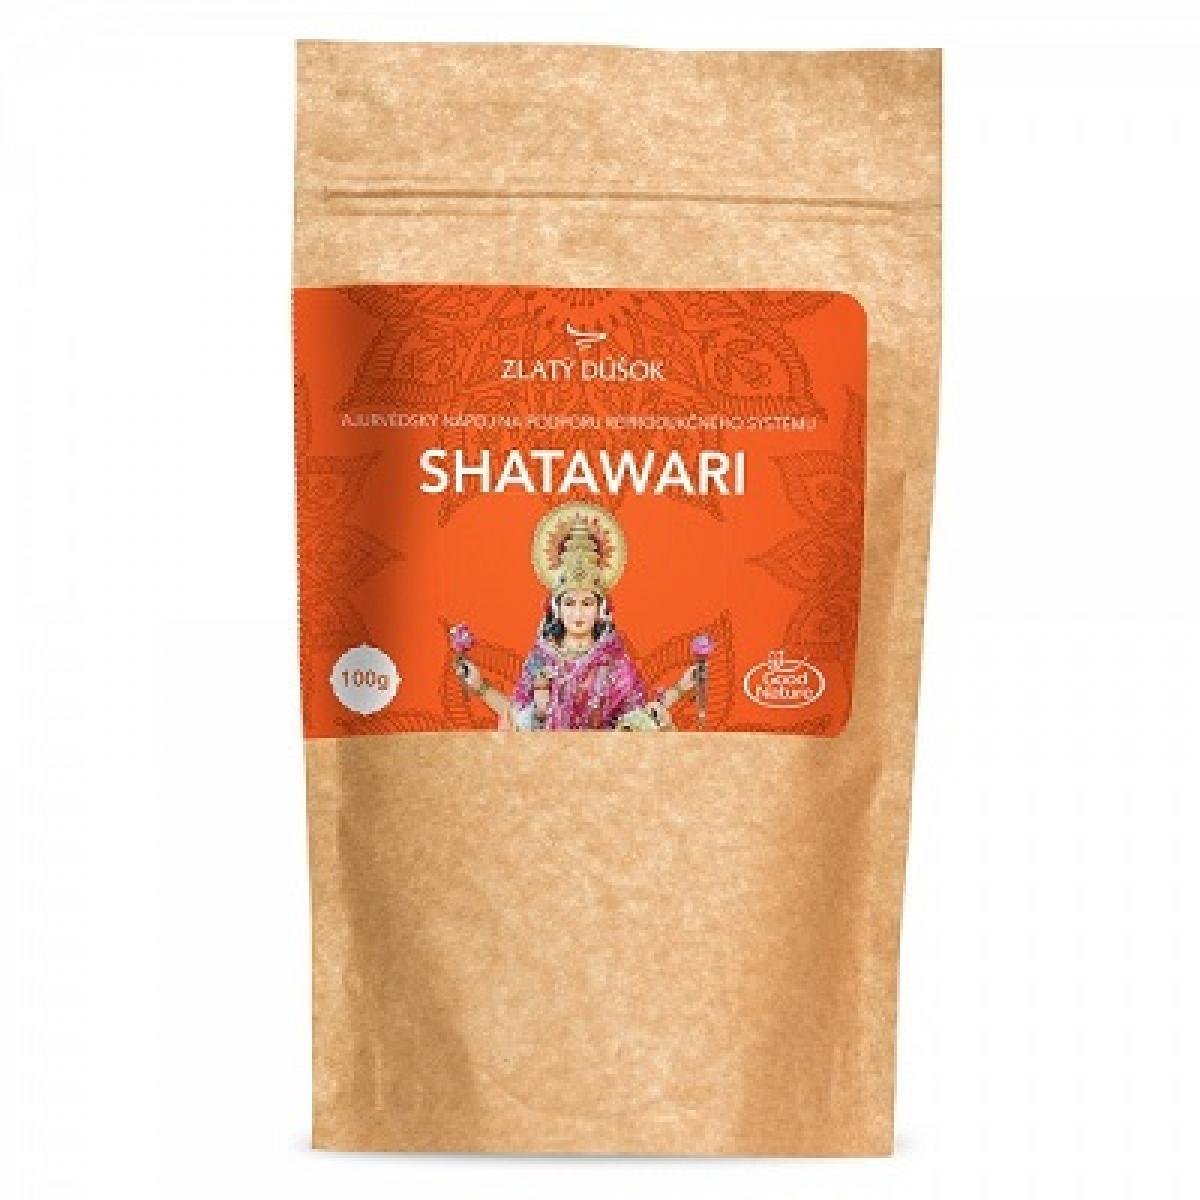 Shatawari - ajurvédsky nápoj - Zlatý dúšok - 100 g